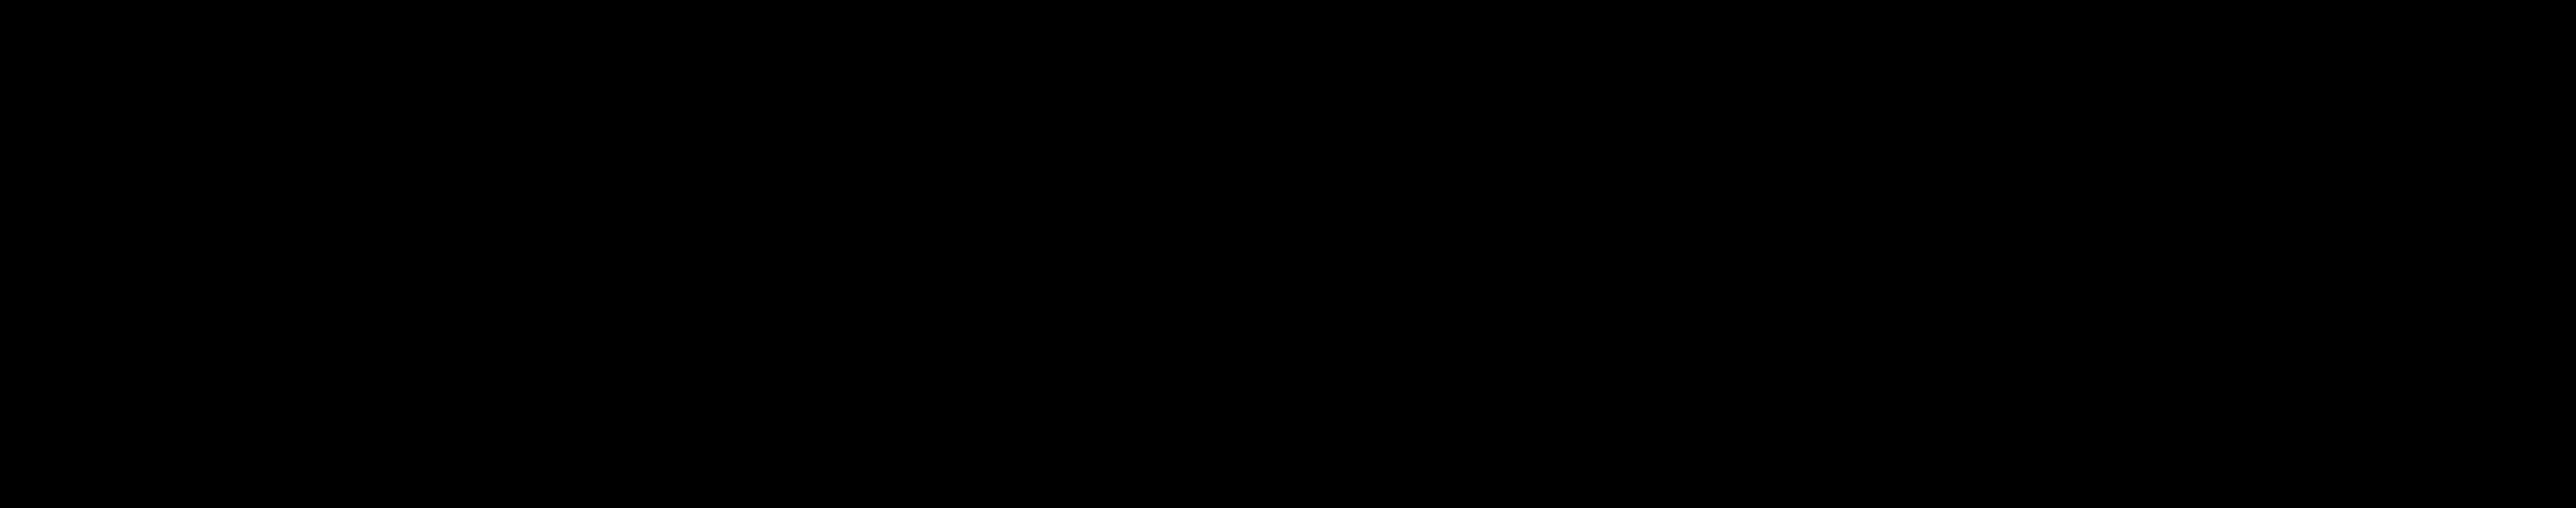 logo-ep-series.png